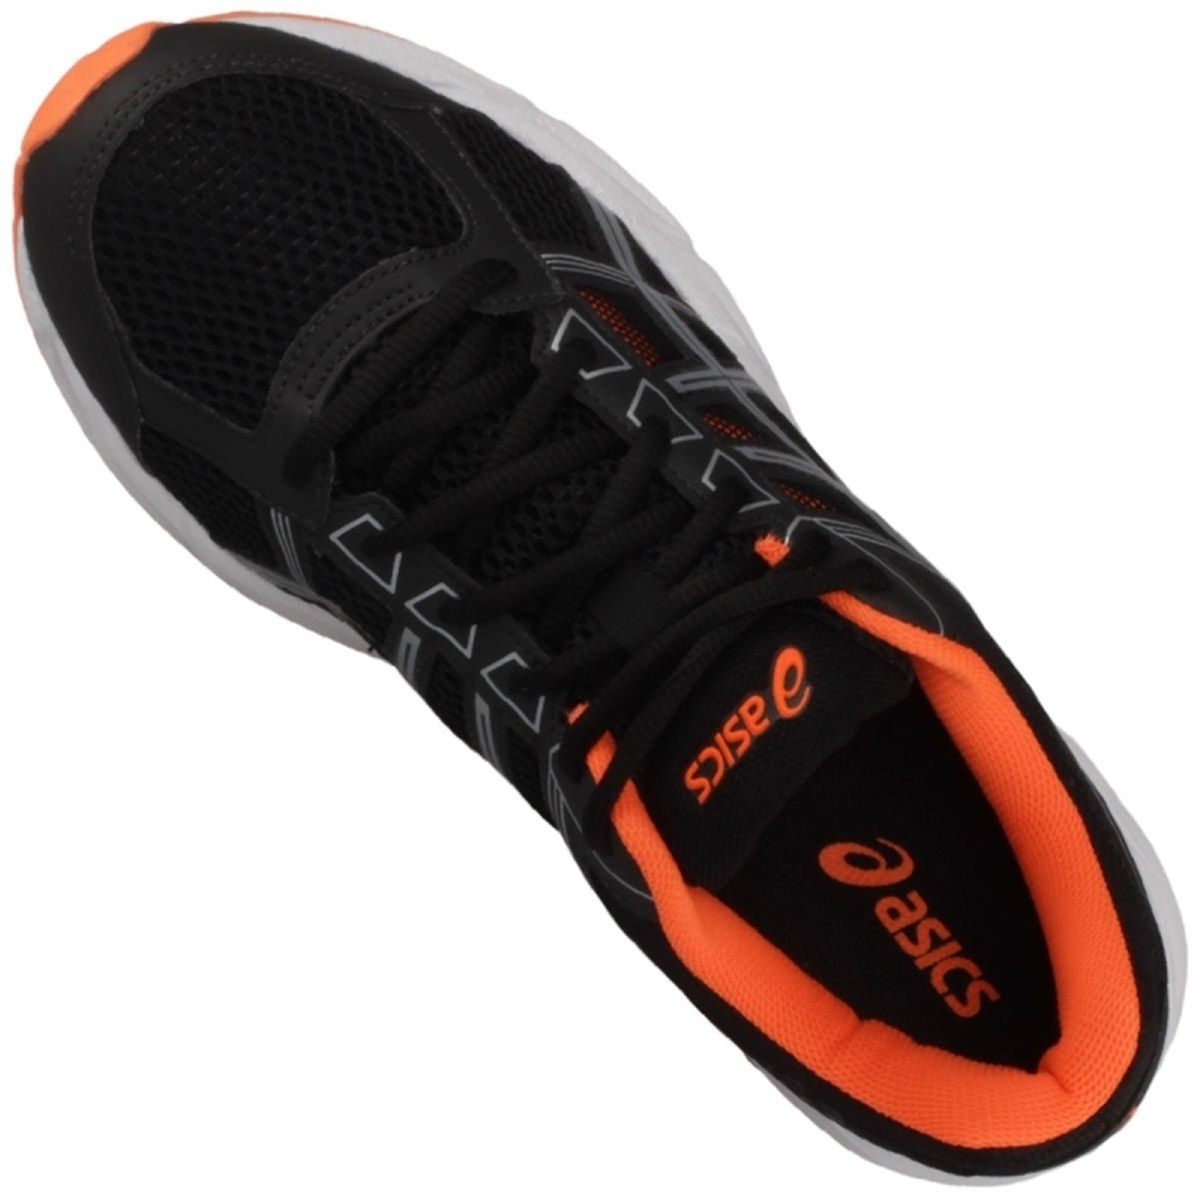 0d88ec1bdb1 Tênis Asics Gel Contend 4 A Masculino T026A.9092 - Linha Esporte